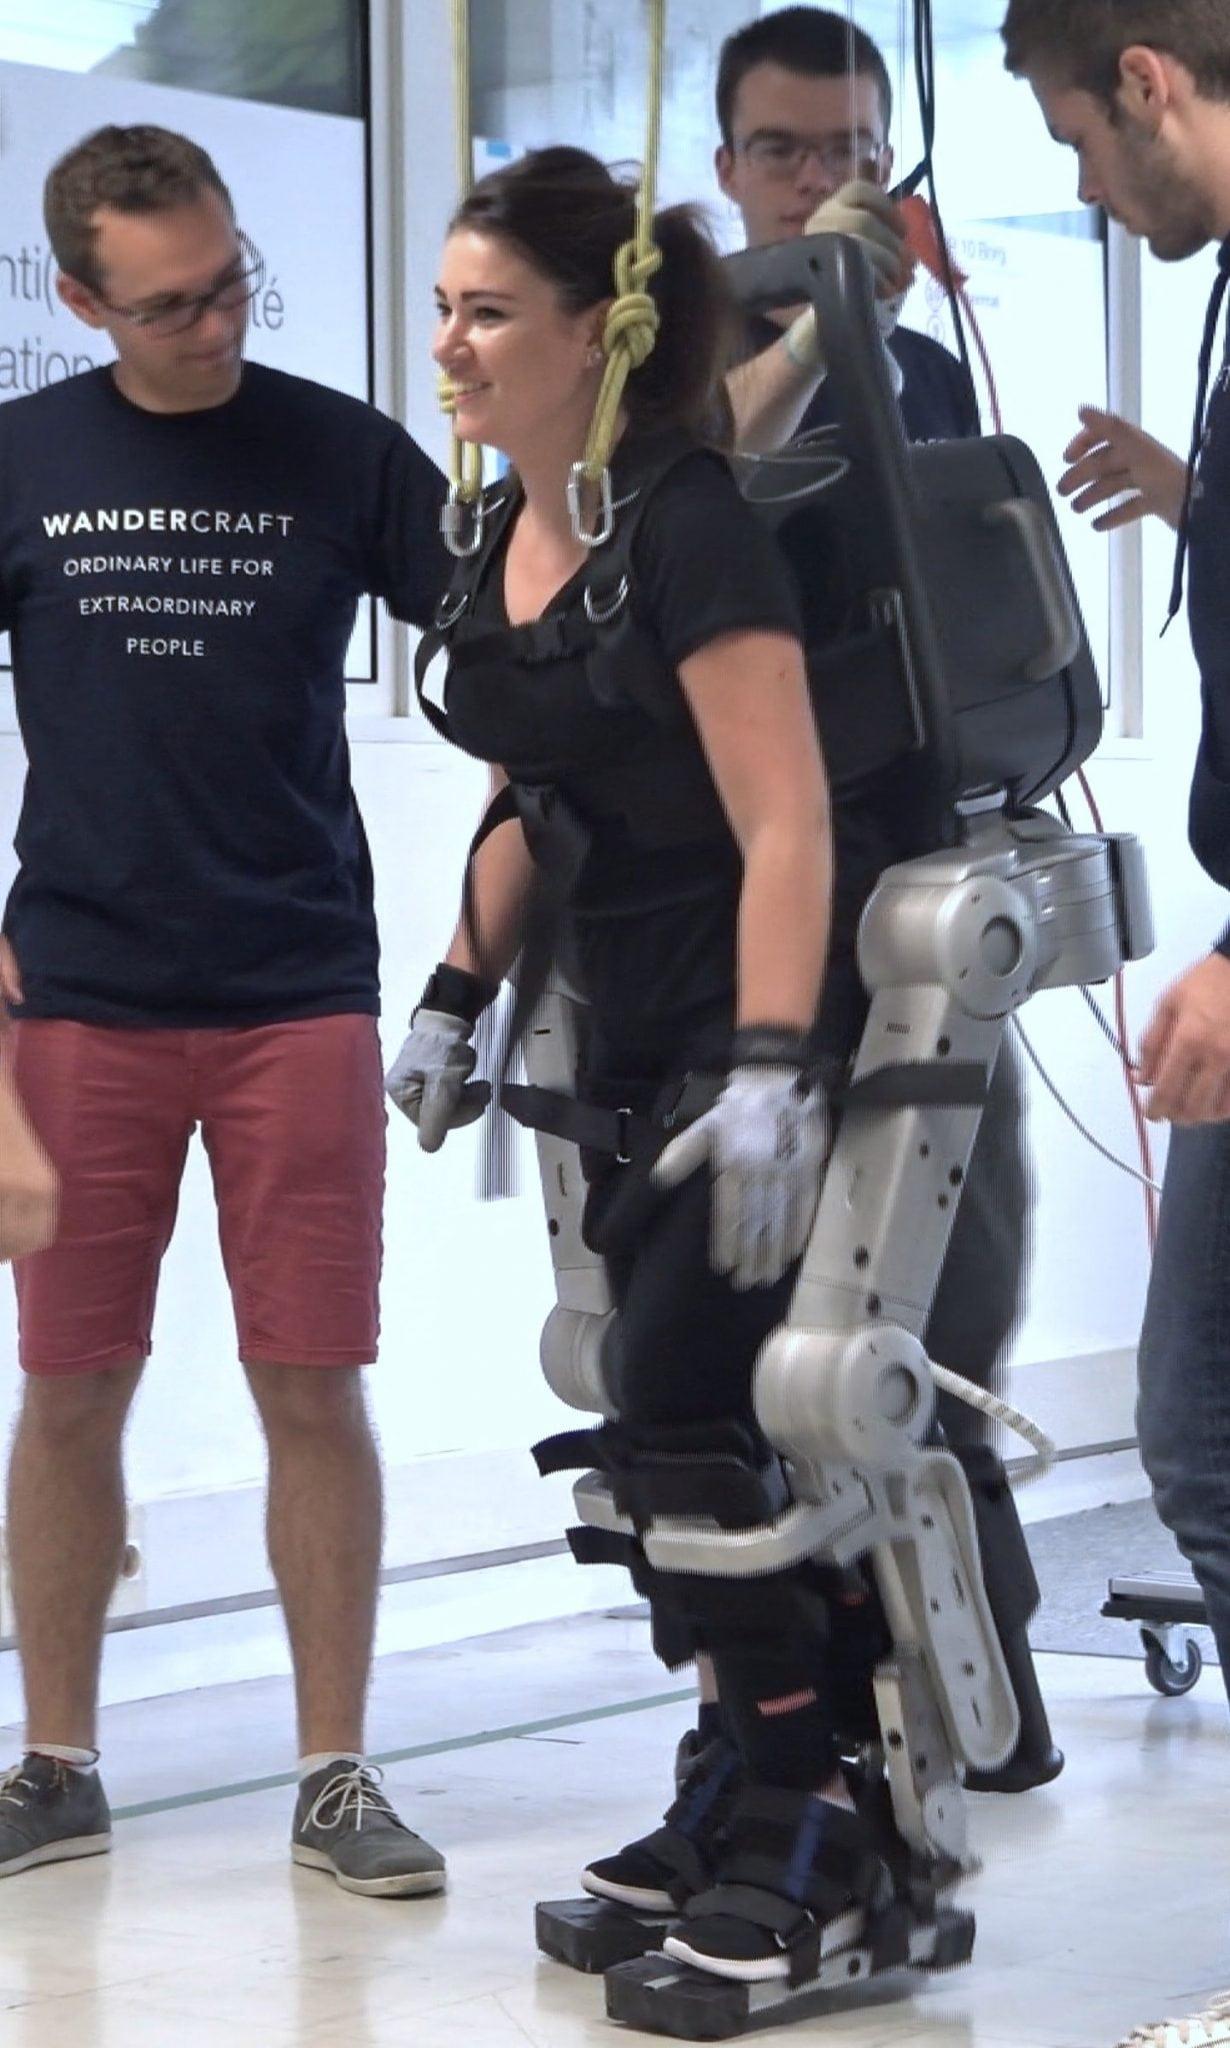 wandercraft-exosquelette